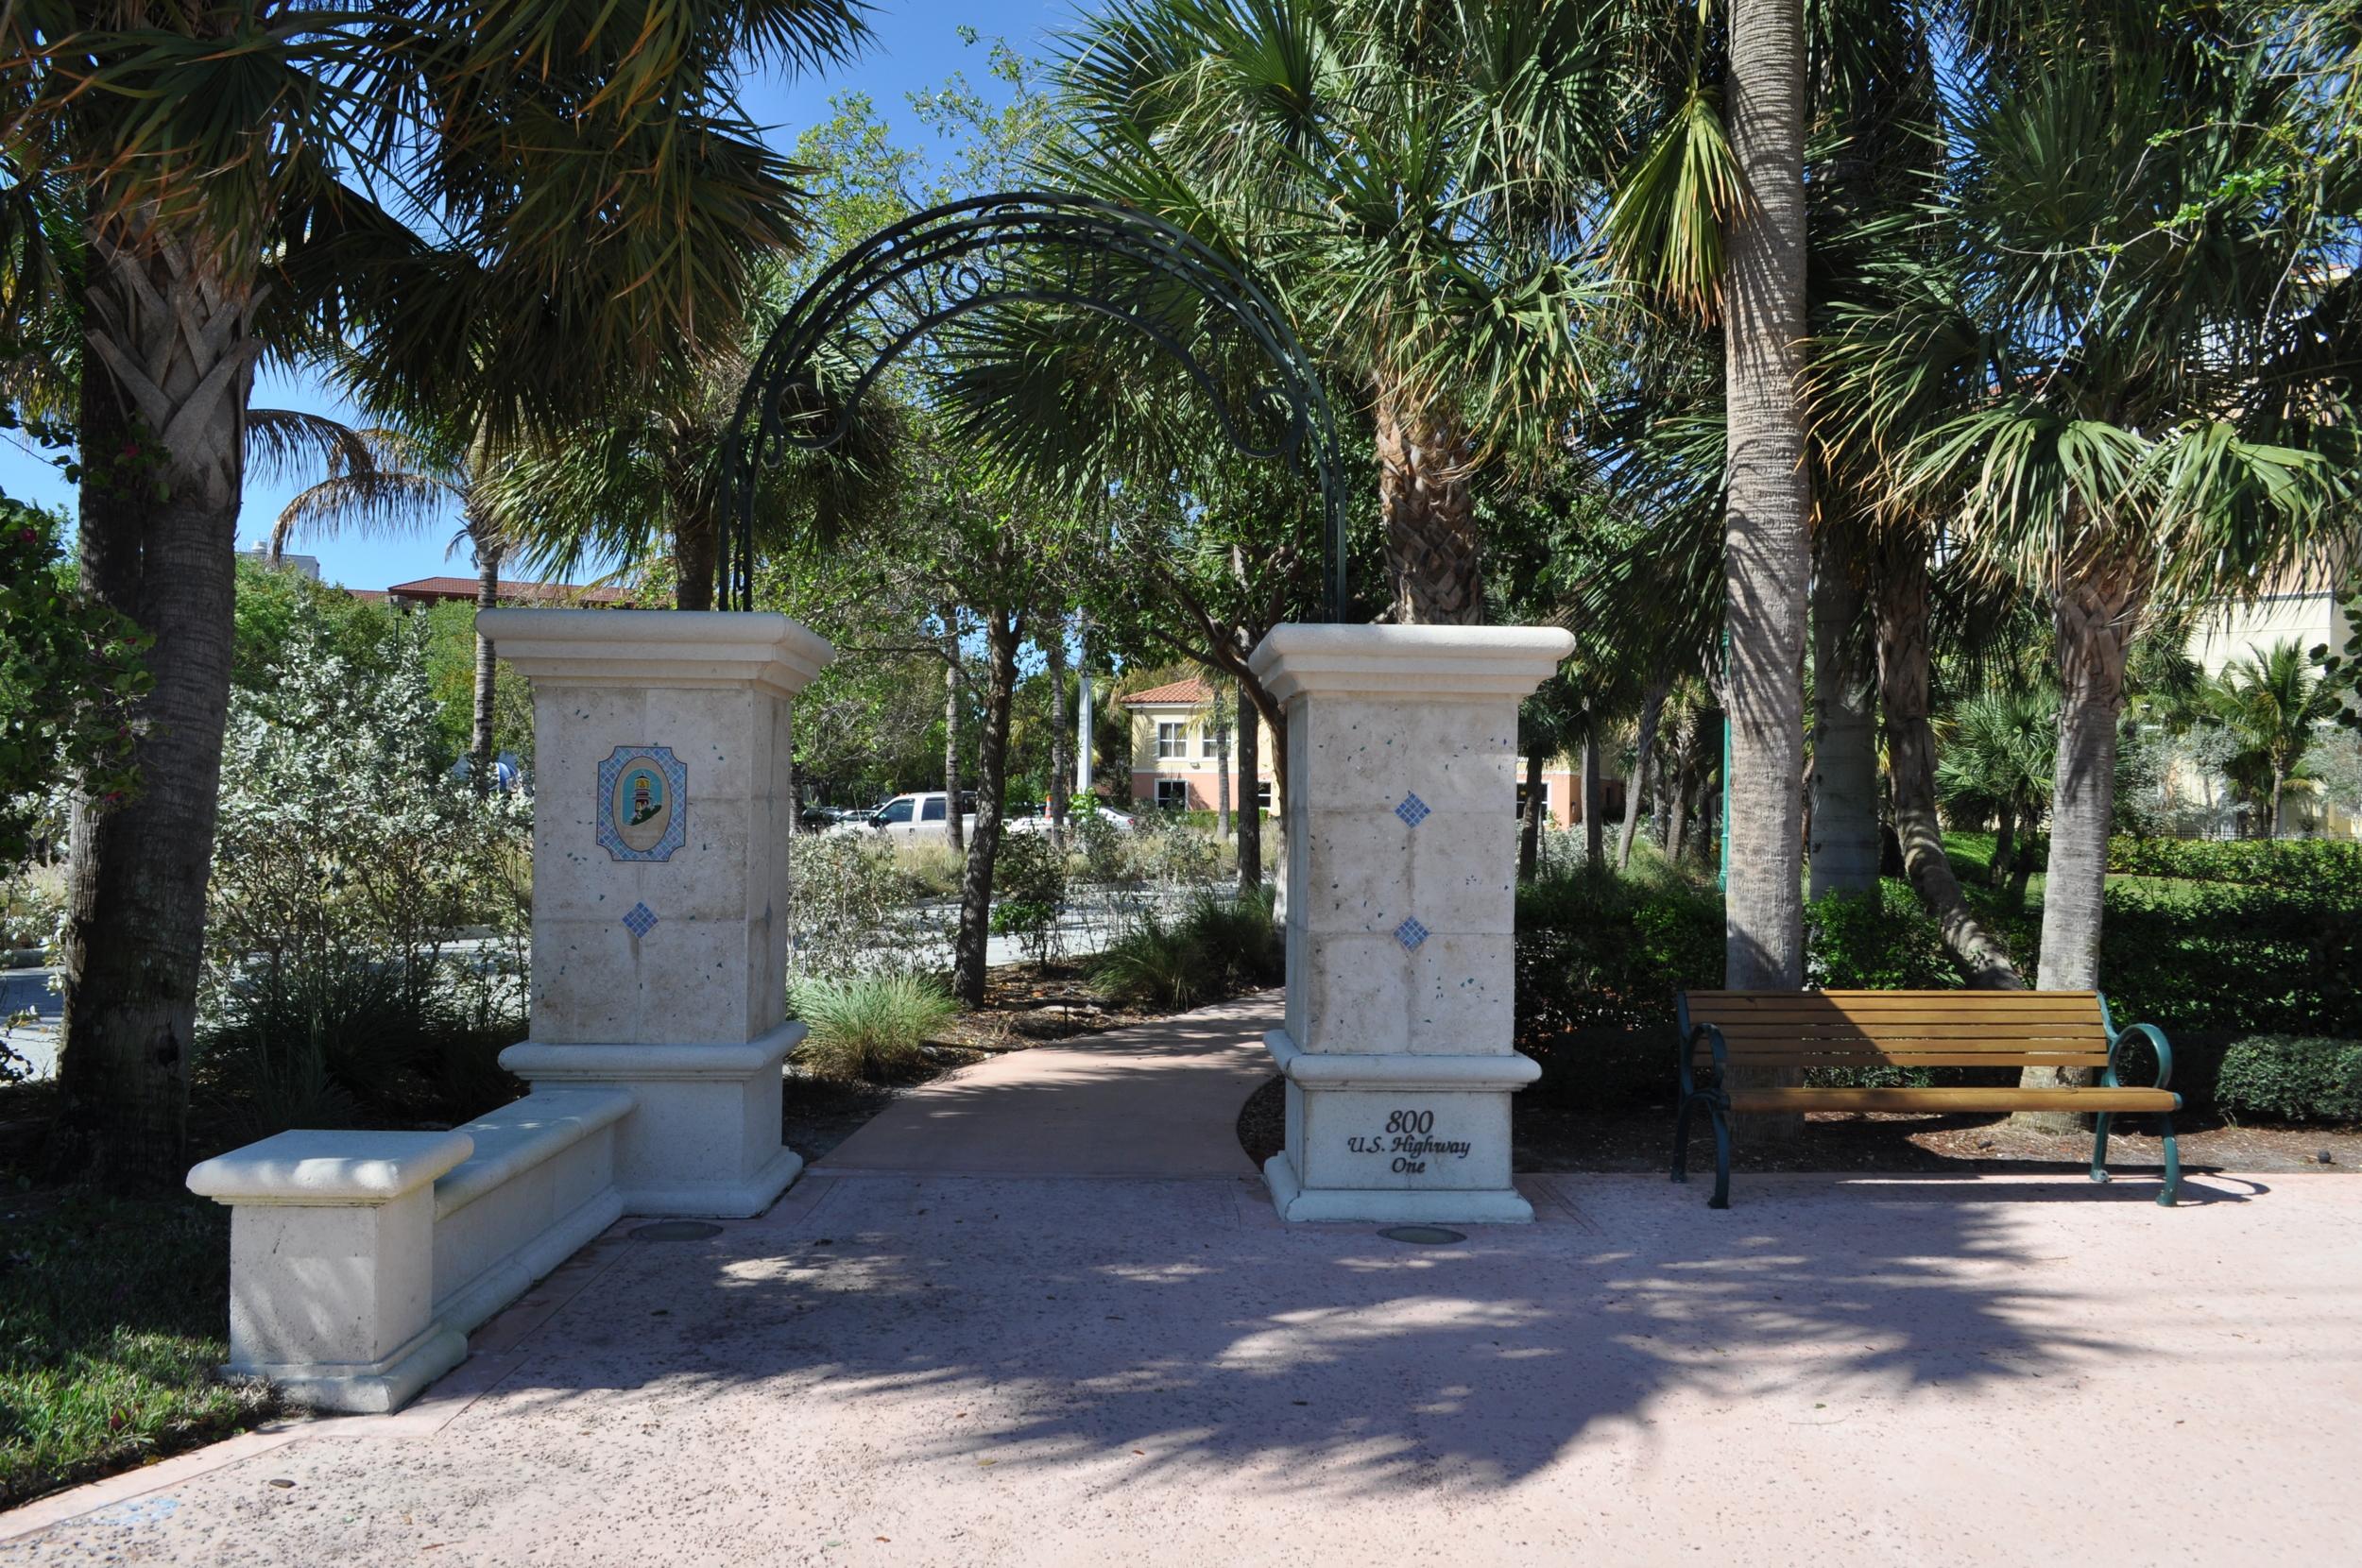 Jupiter Yacht Club Florida Riverwalk Gateway Entry Bench.JPG